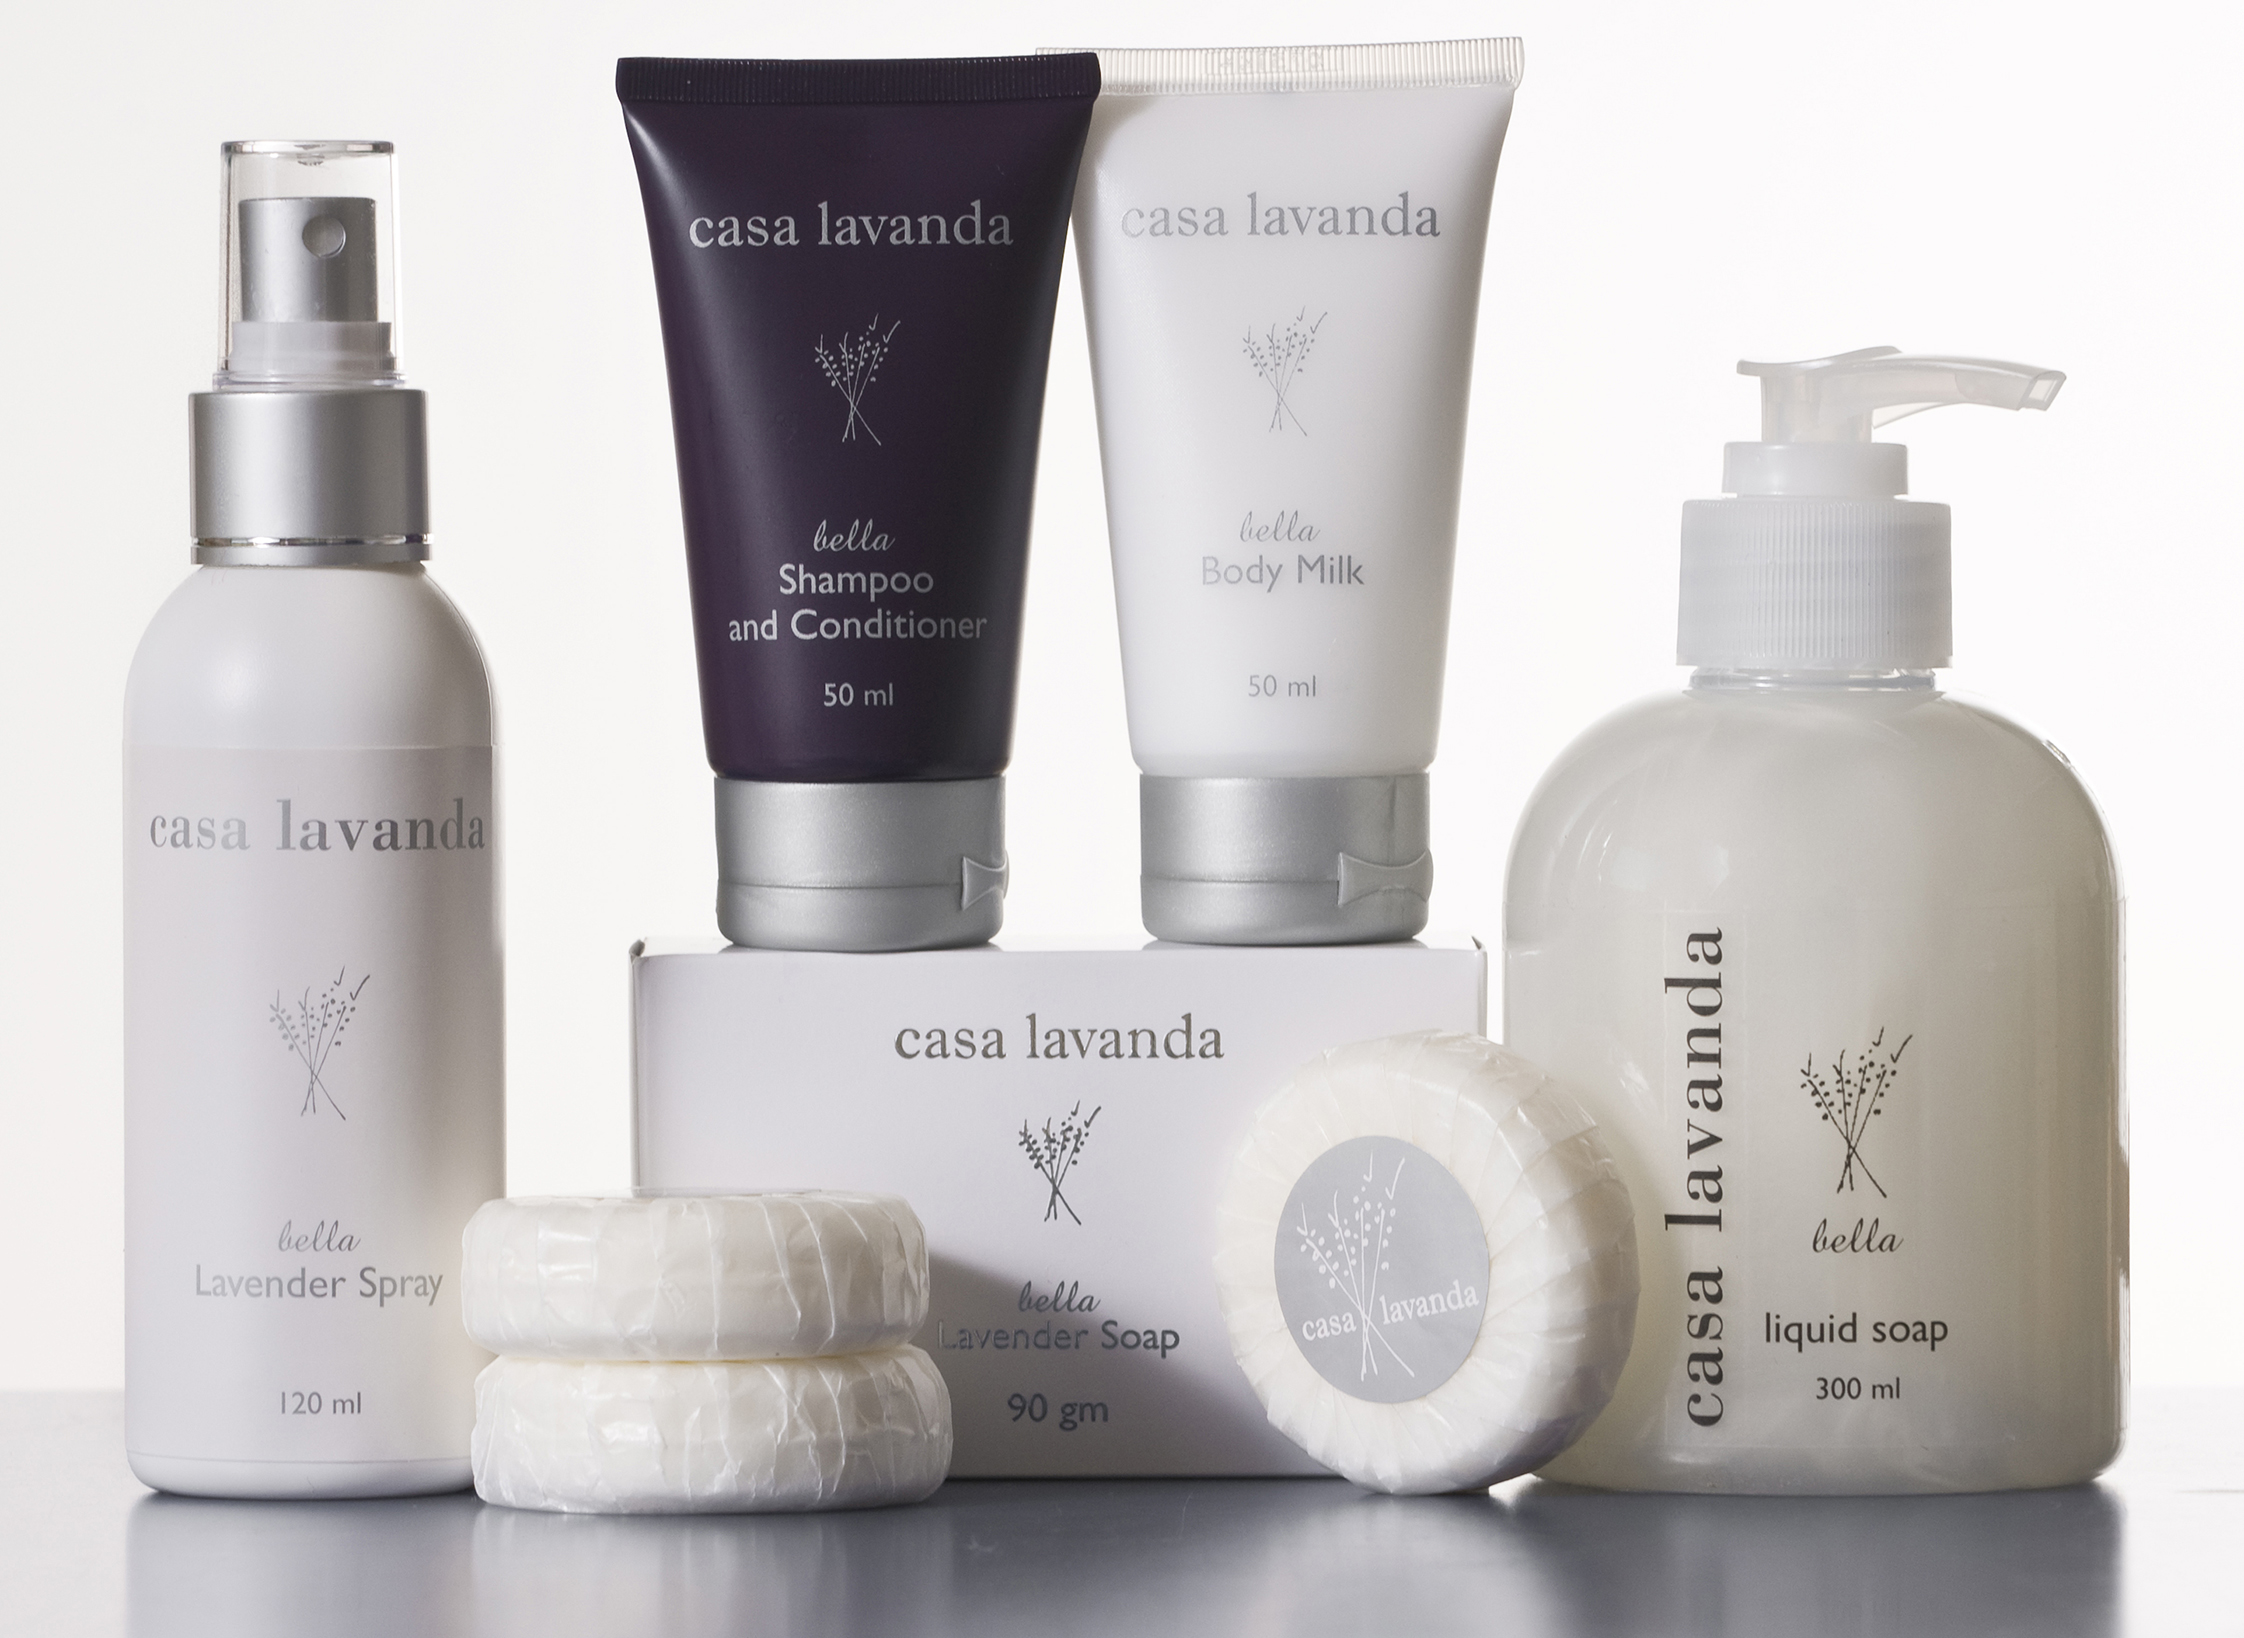 Casa Lavanda - Hawke's Bay lavender oil body products